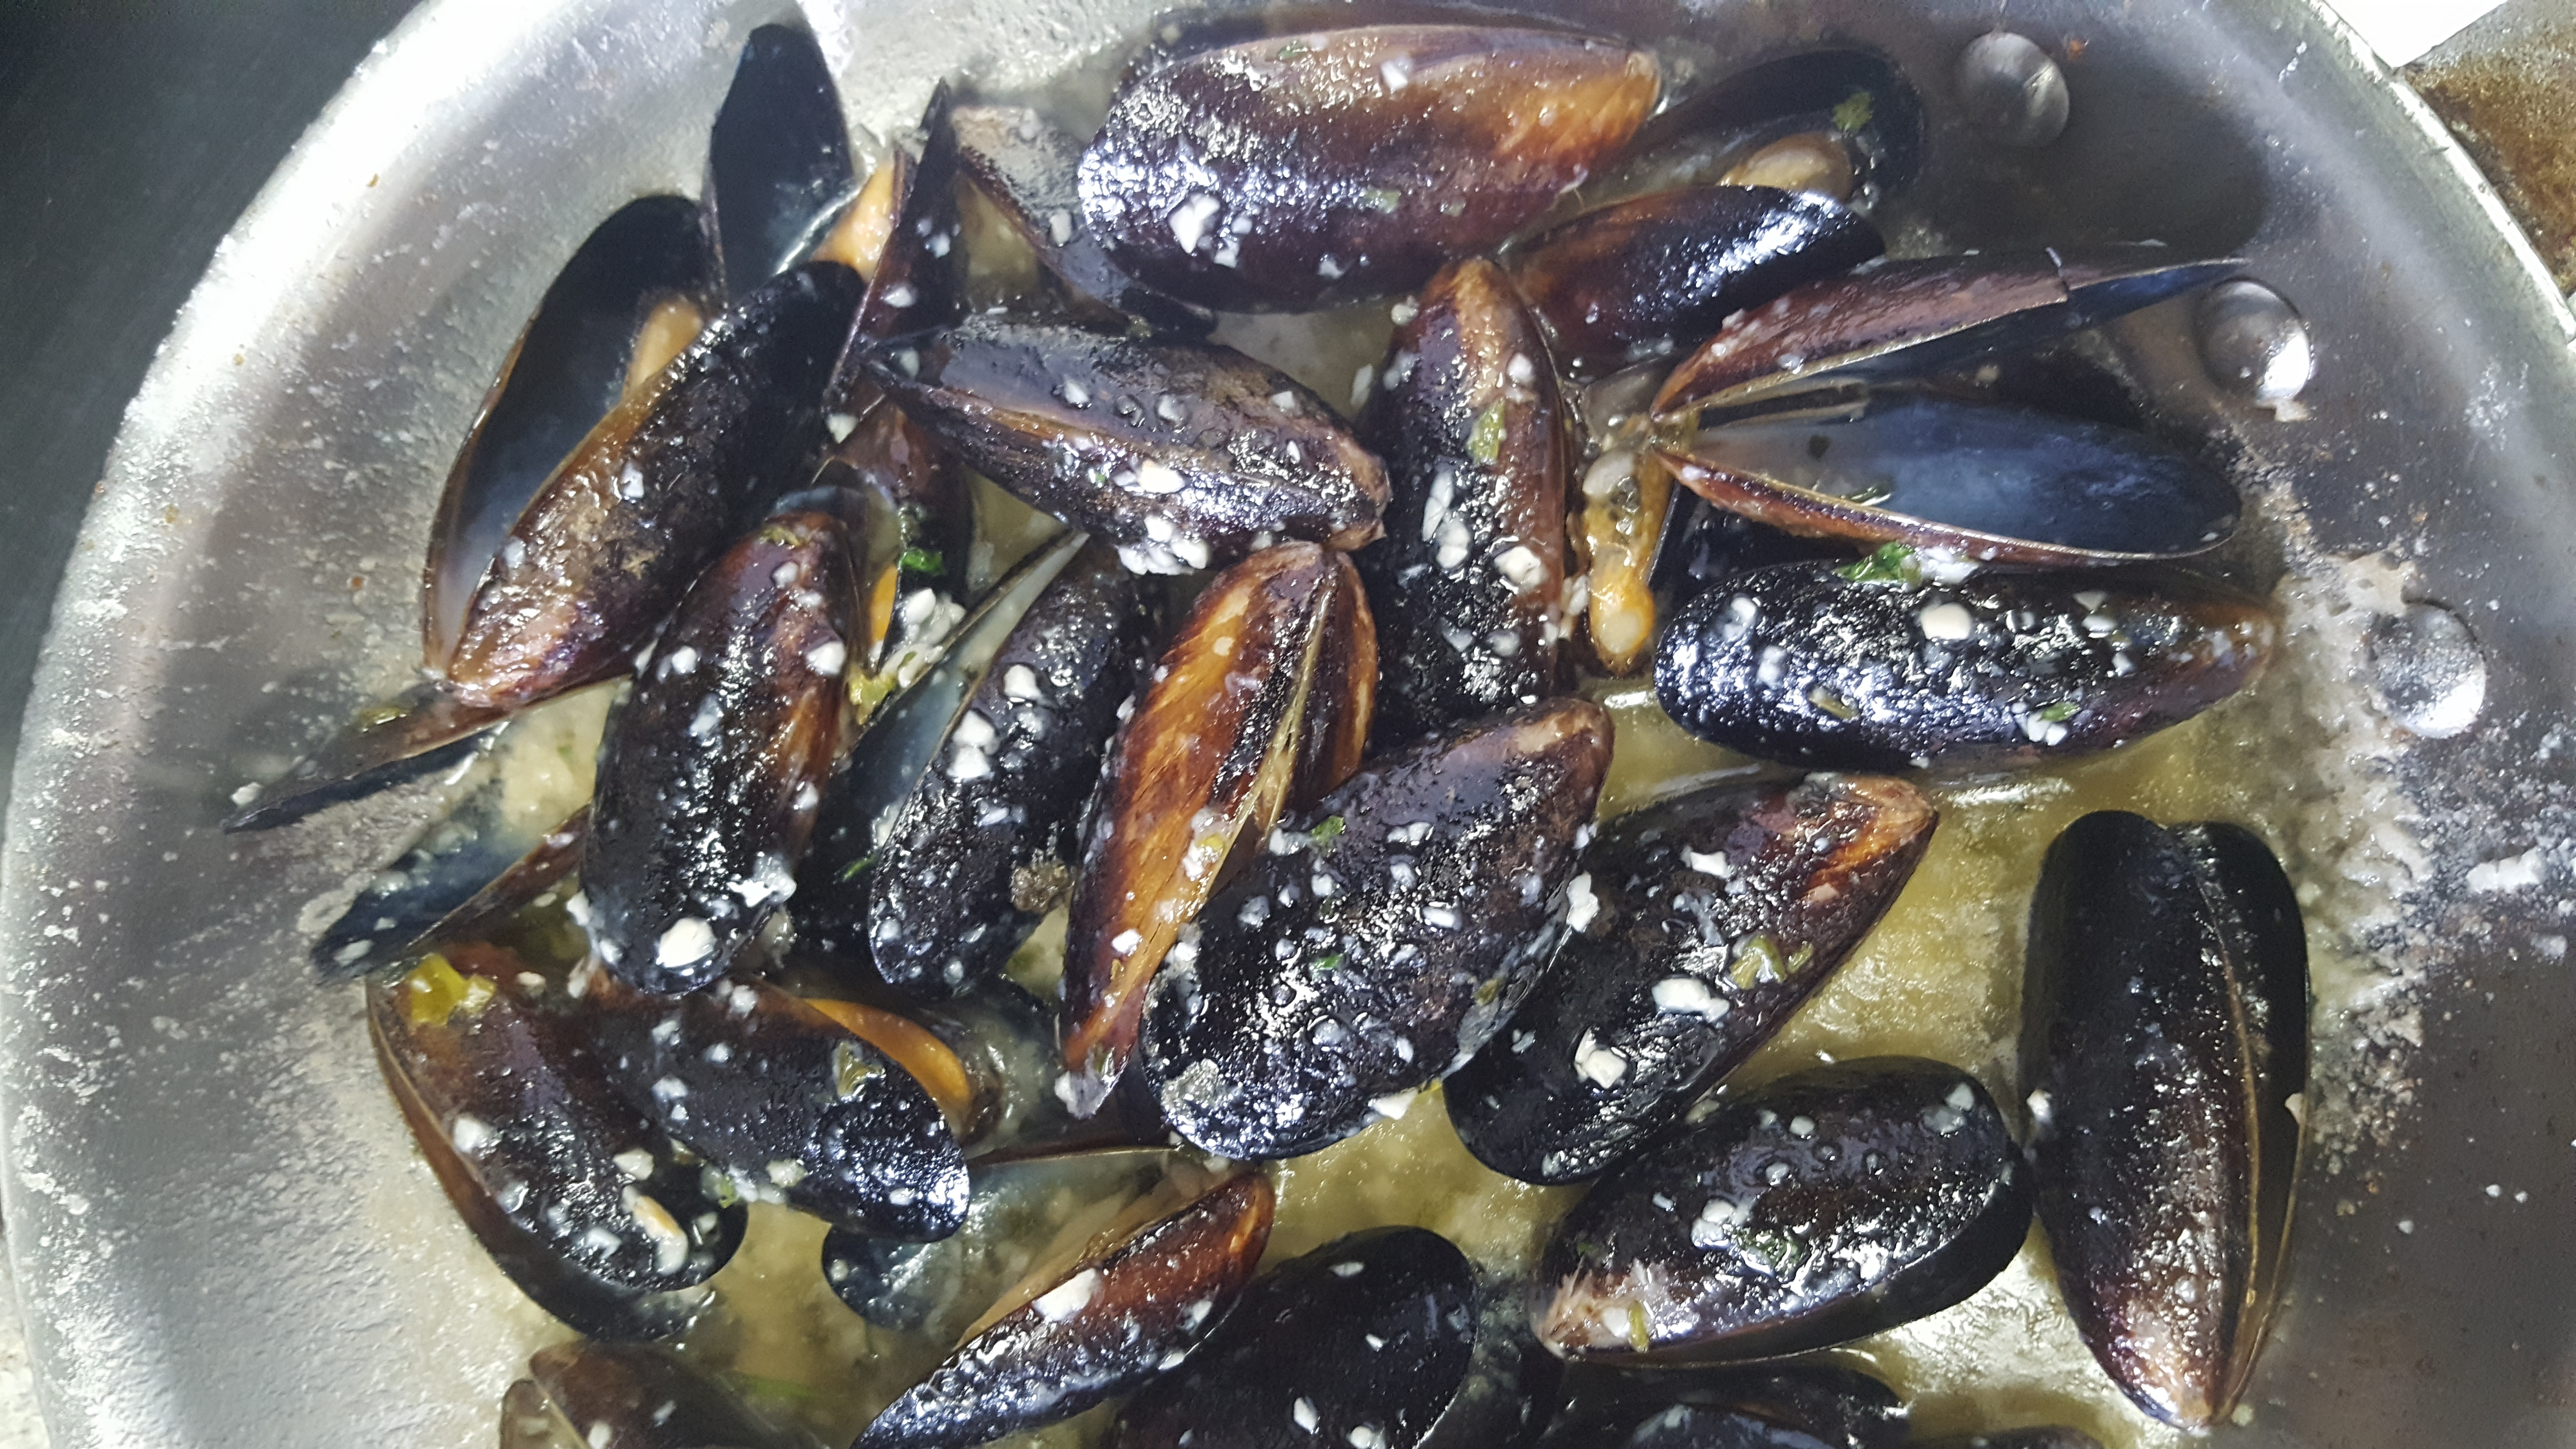 Food Near Asheboro Nc